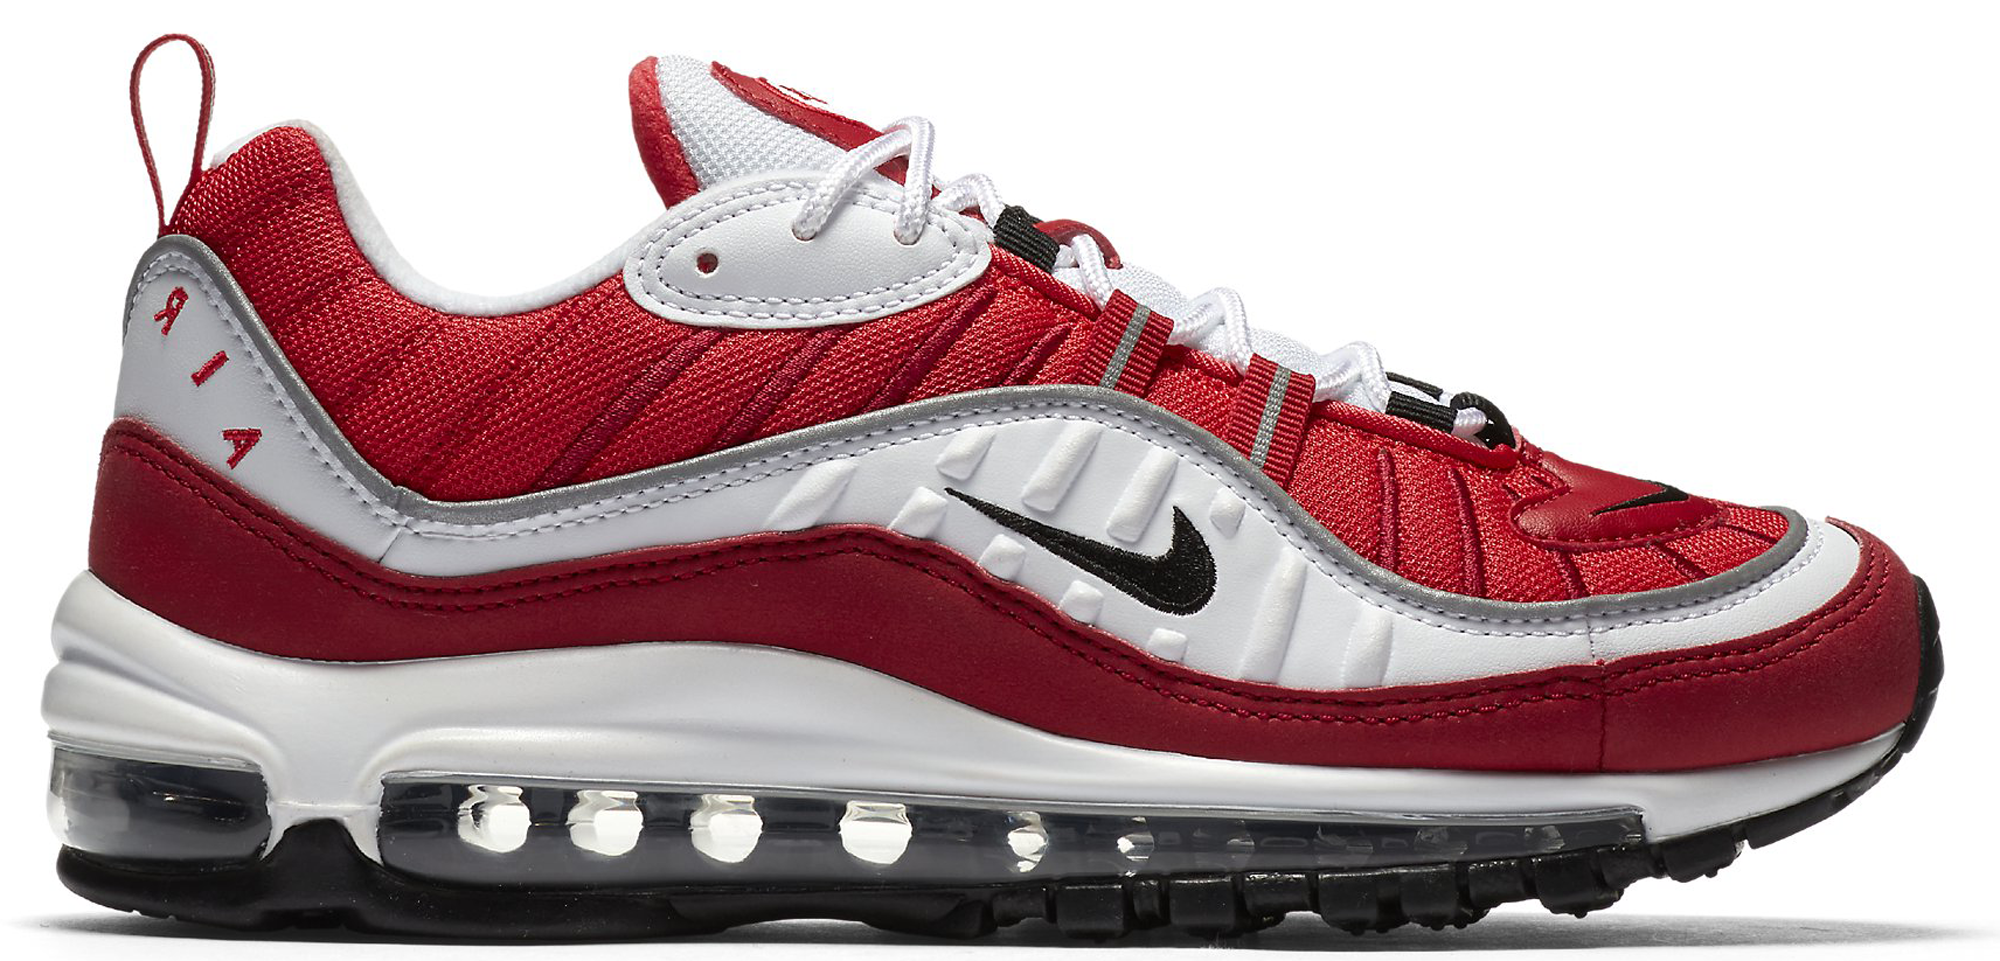 Air Max 98 Gym Red (W)